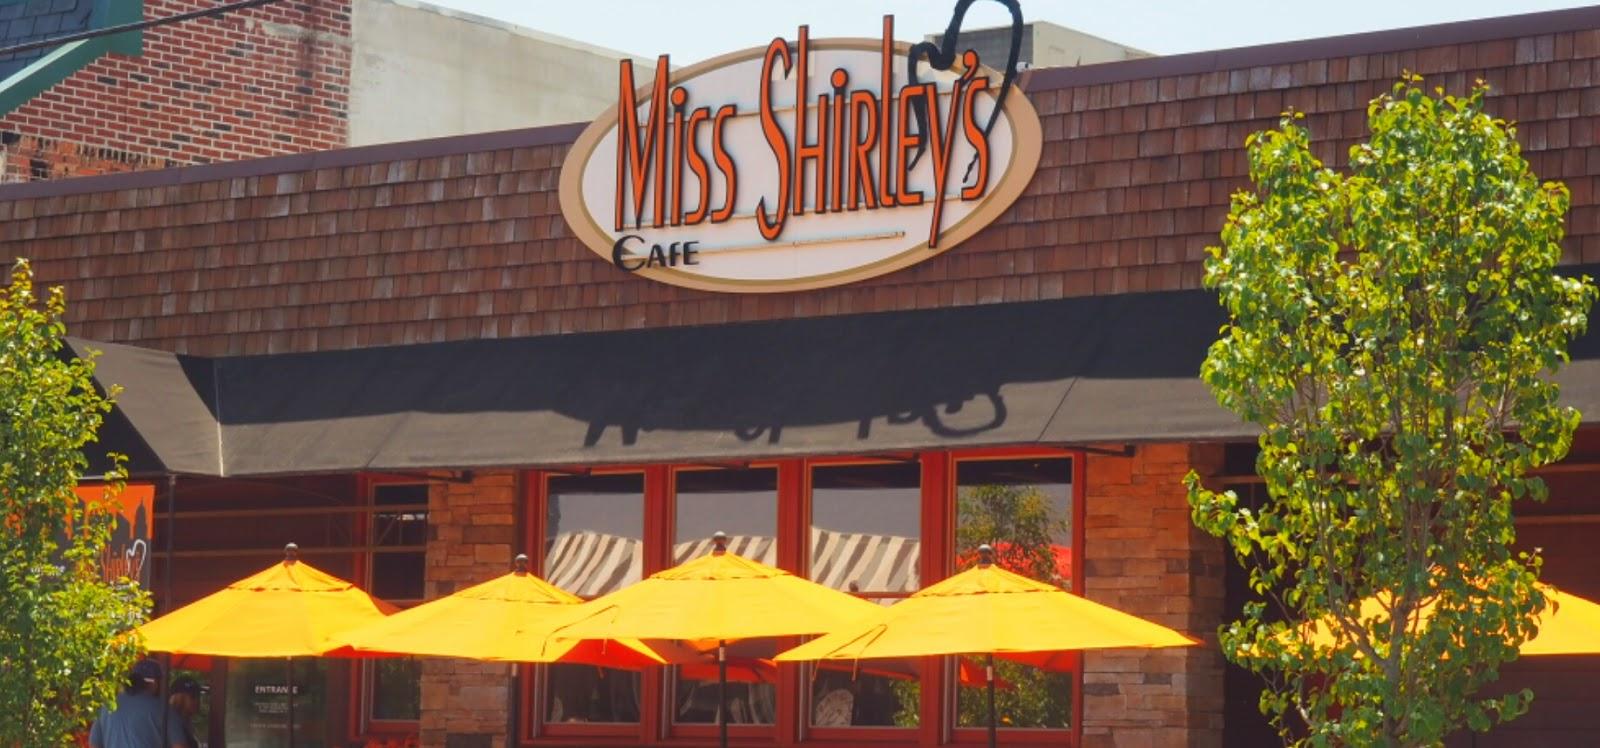 Miss Shirleys